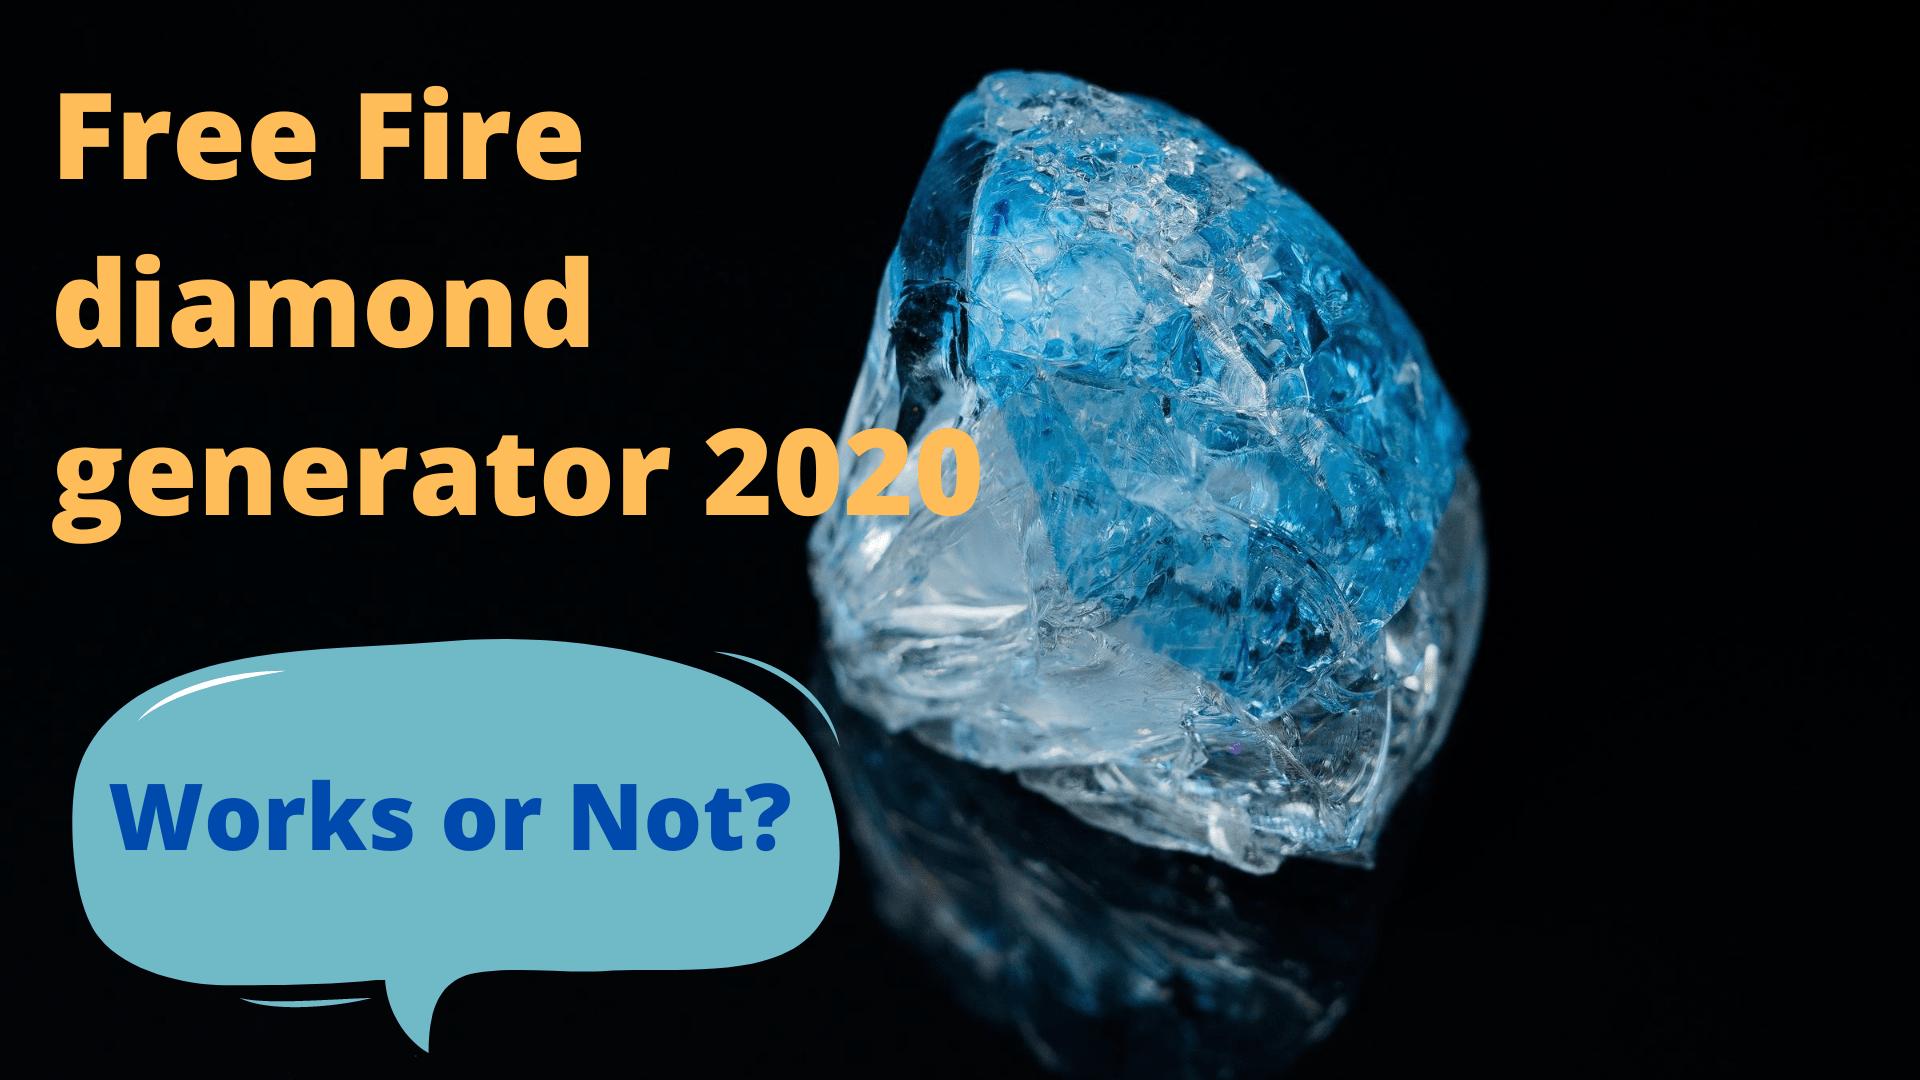 Free Fire diamond generator 2020